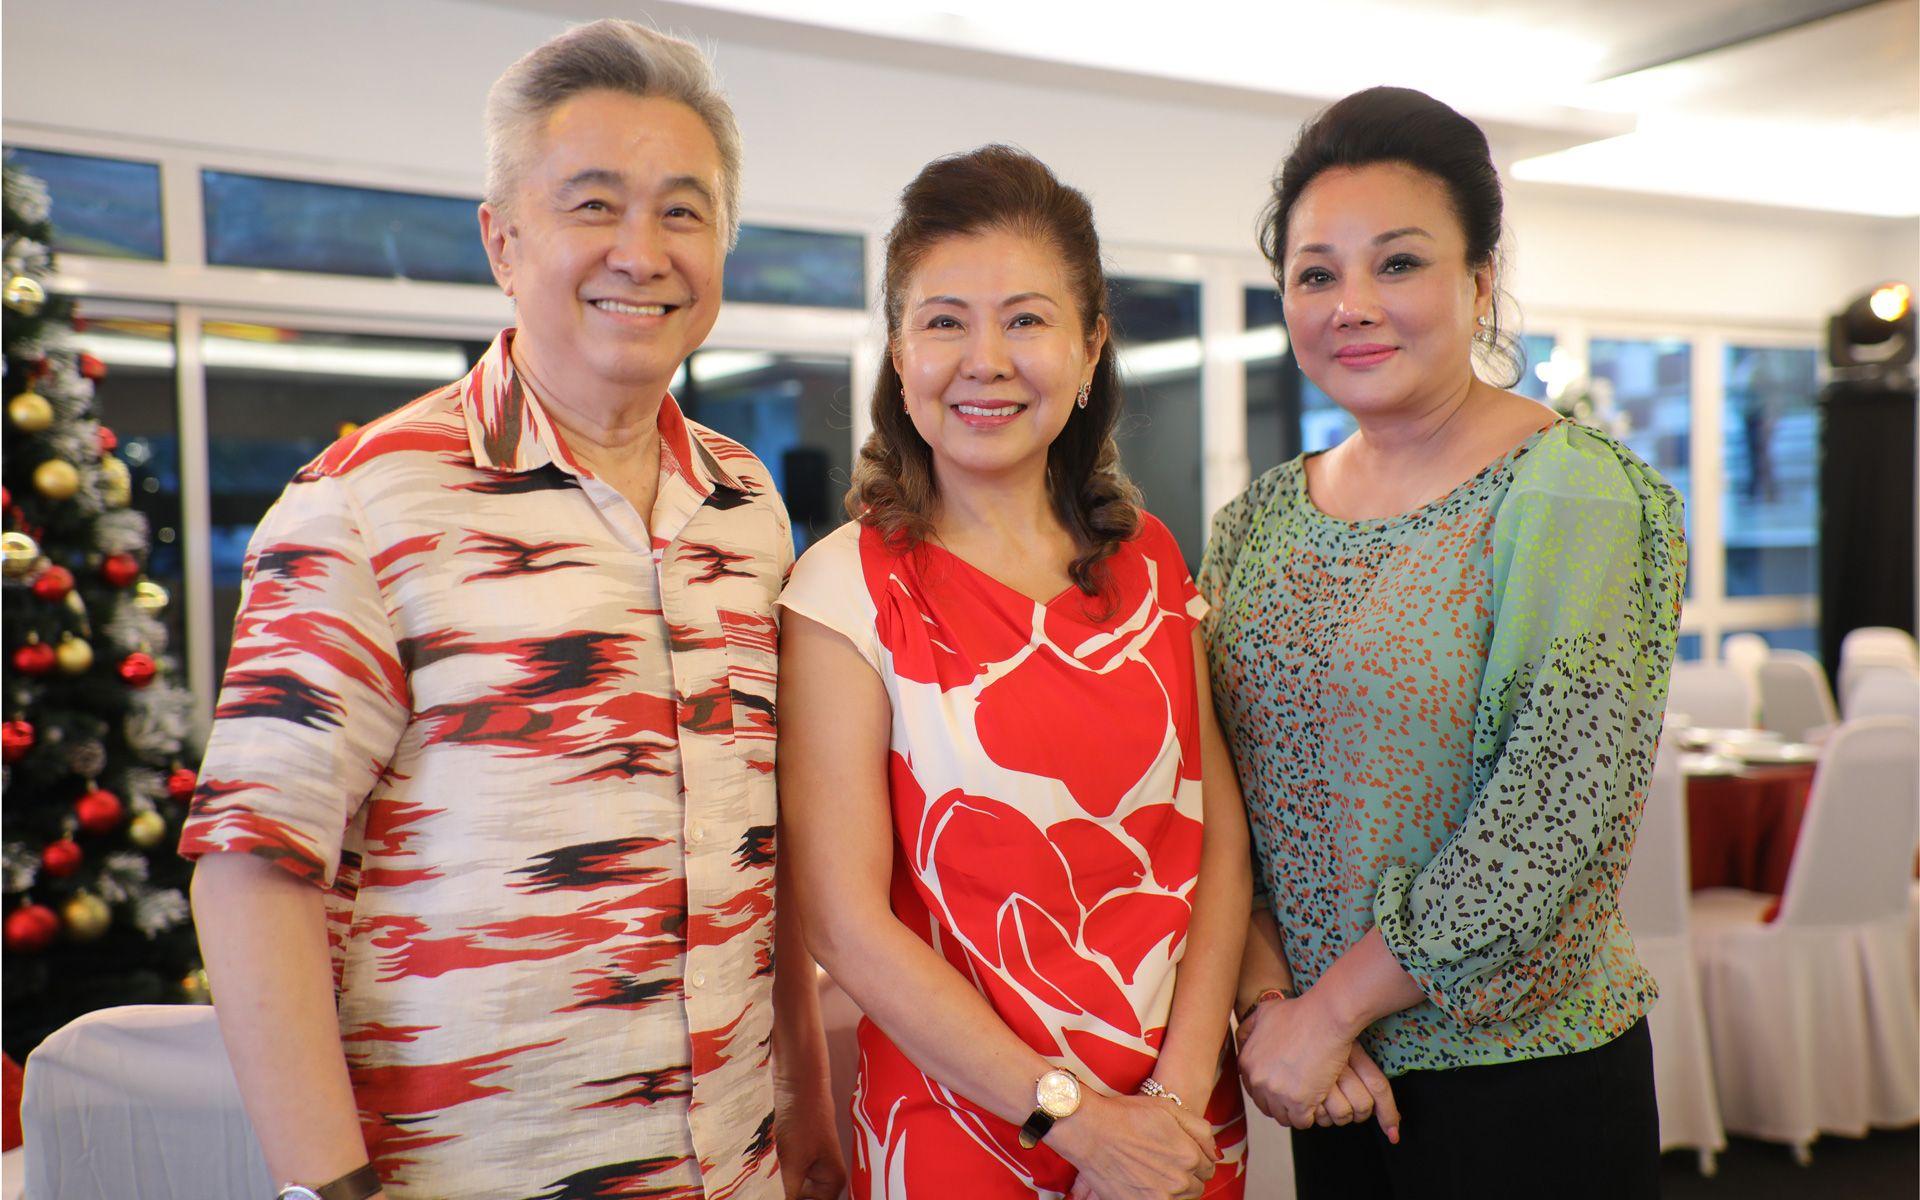 Tan Sri Lim Huah Leong, Puan Sri Wendy Lim and Dato' Sri Tracy Ong